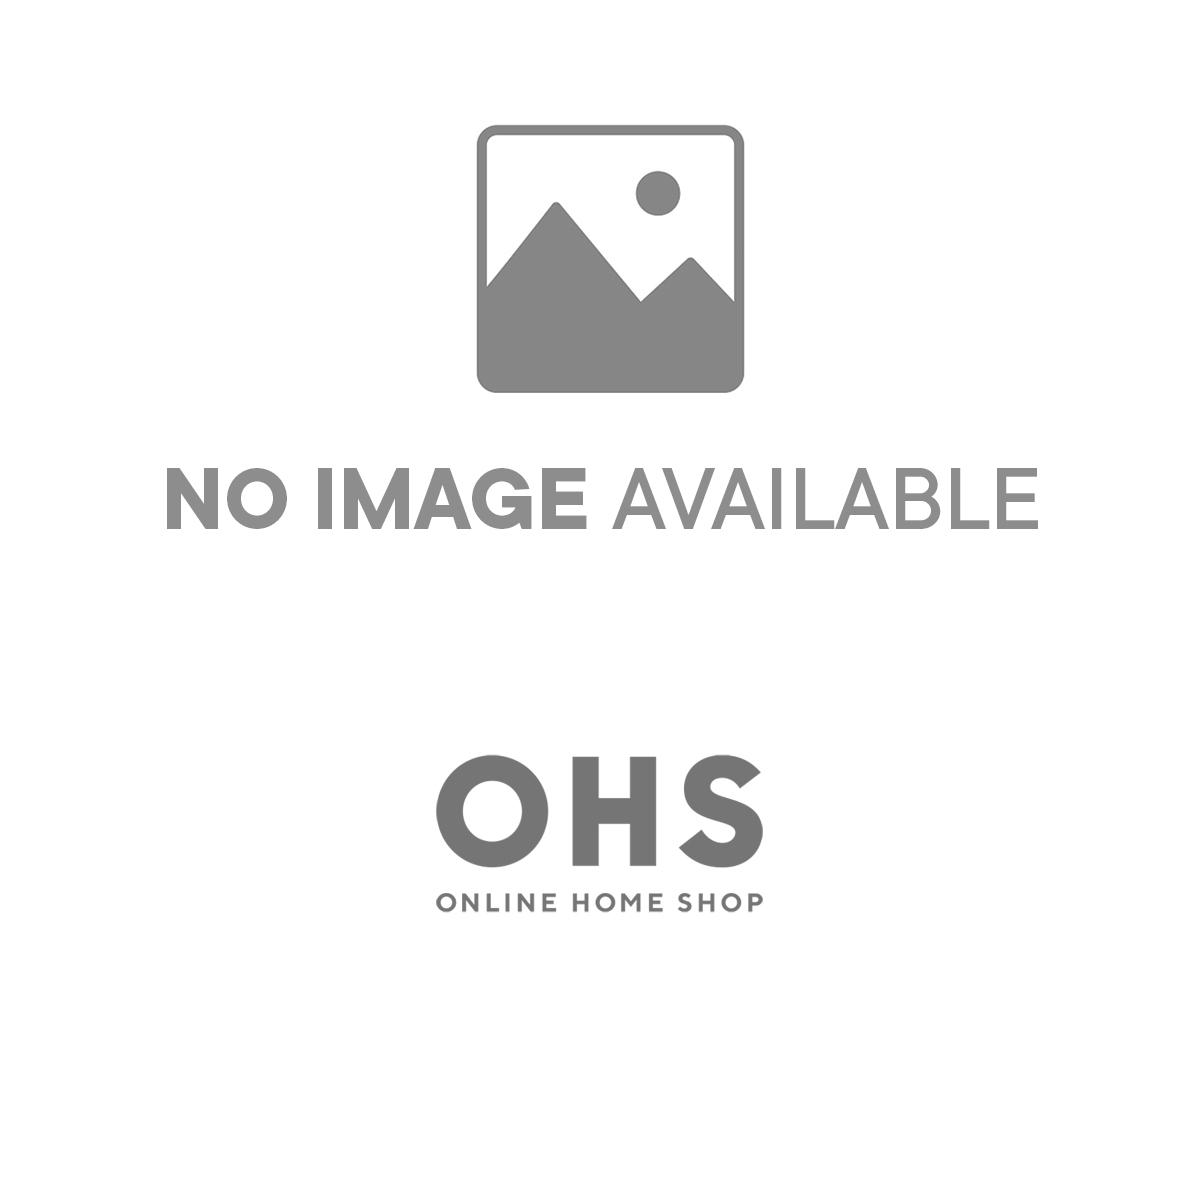 Sienna Home Large Shimmer Knit Tassel Throw, Grey - 150 x 180cm